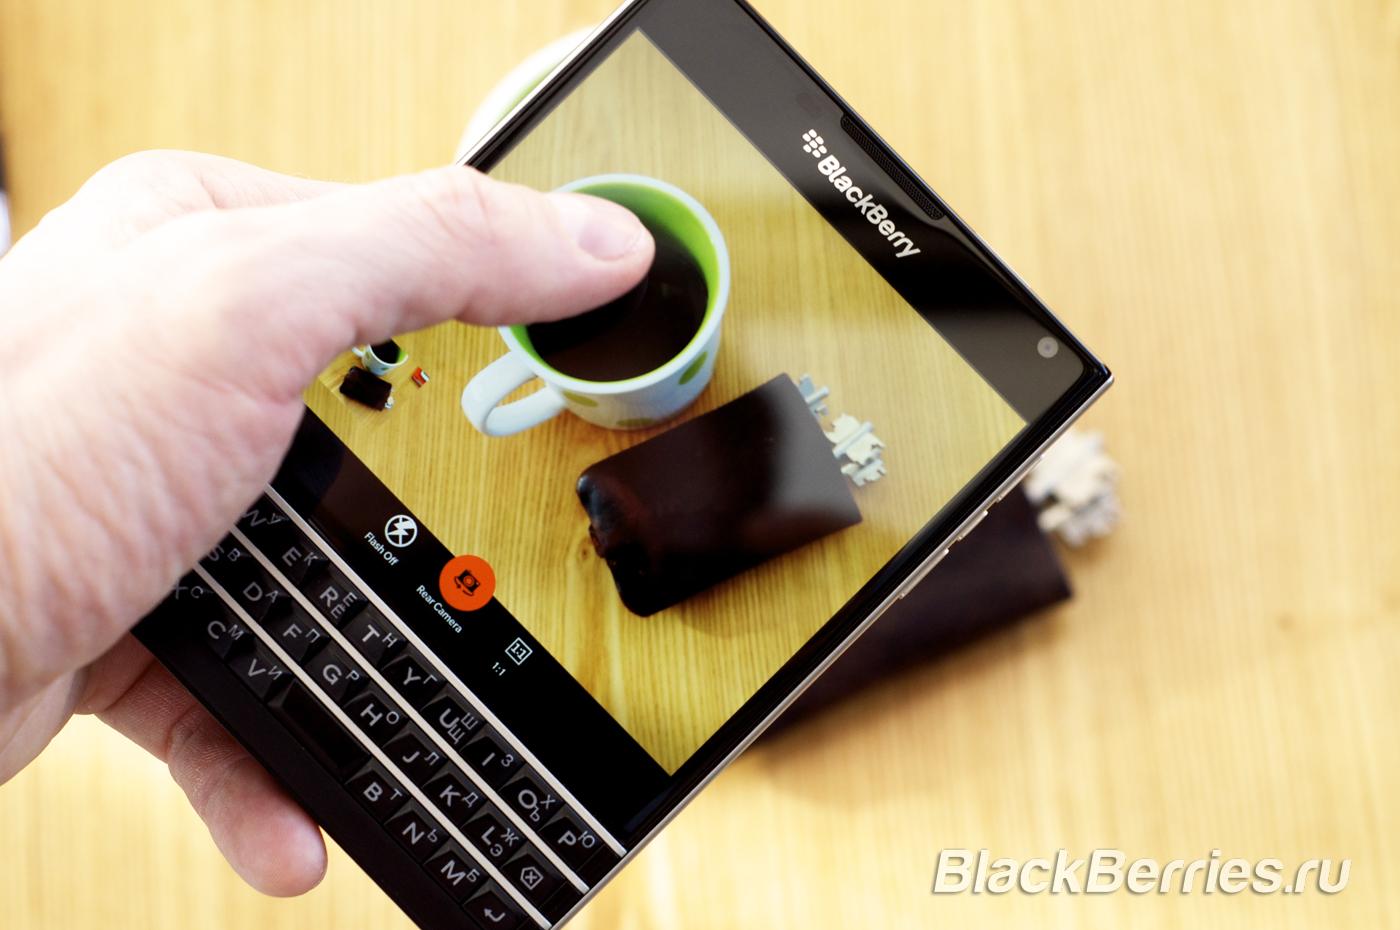 BlackBerry-Passport-Classic-Camera